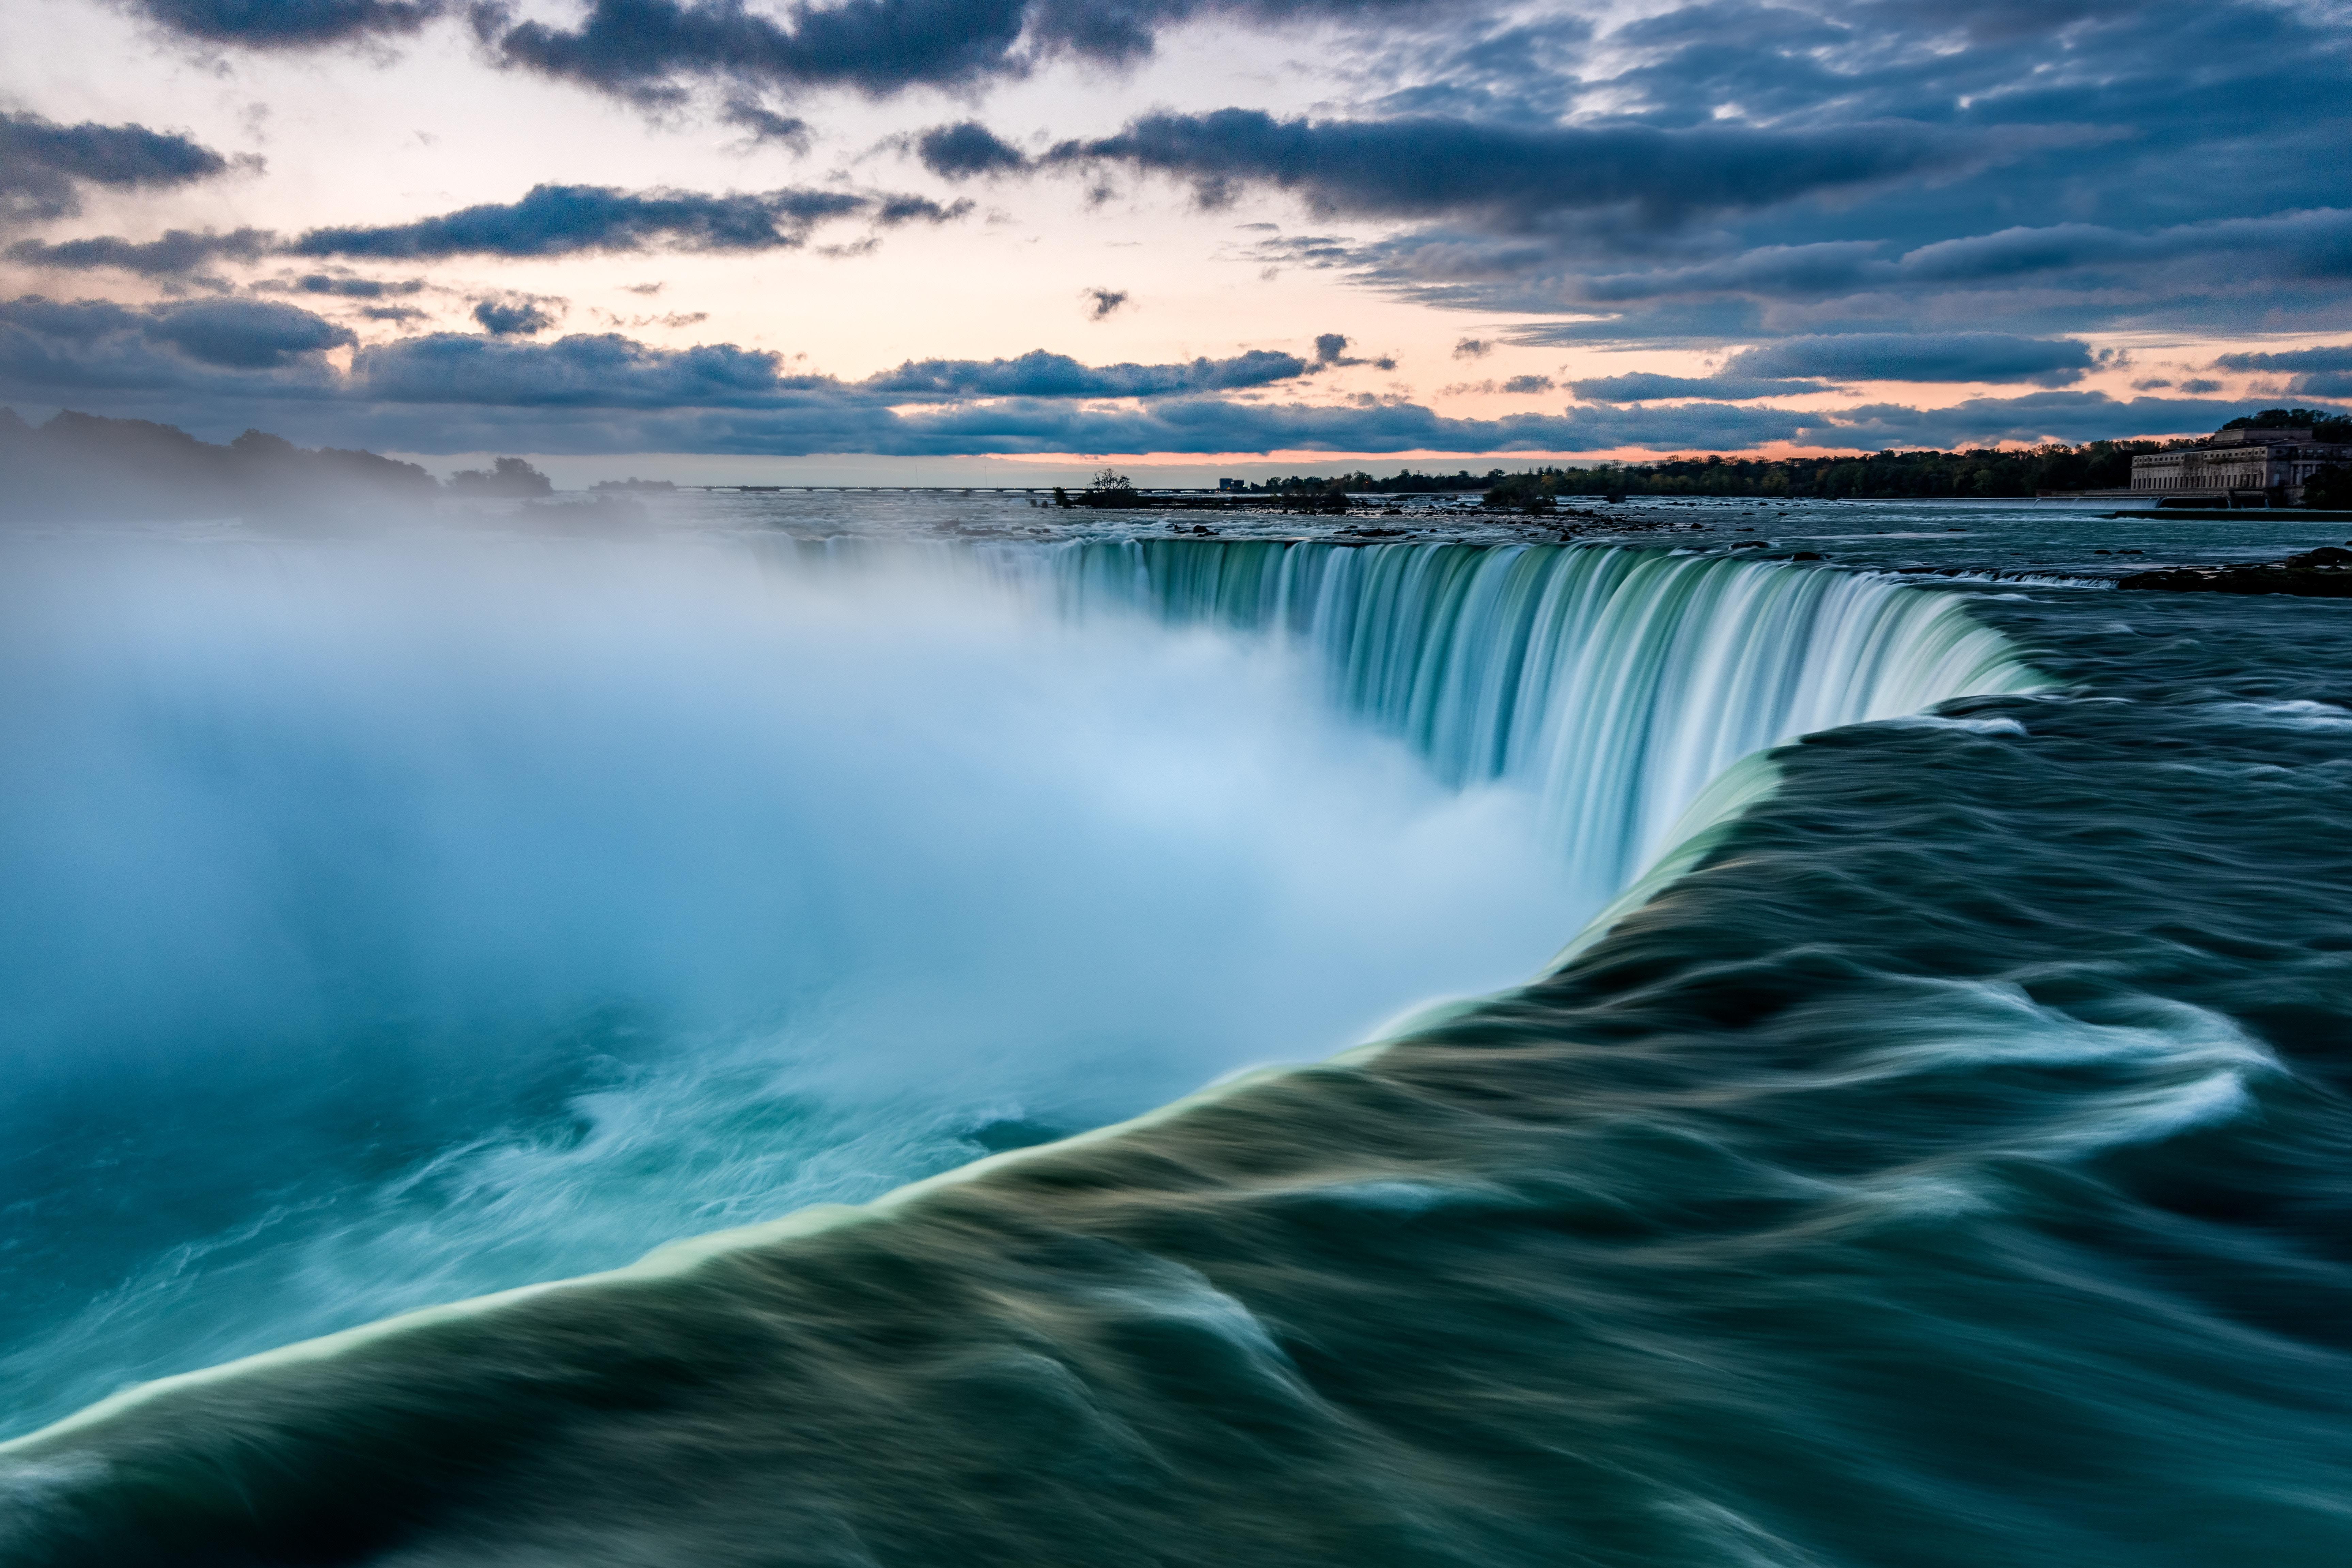 Niagara Falls 5k, HD Nature, 4k Wallpapers, Images